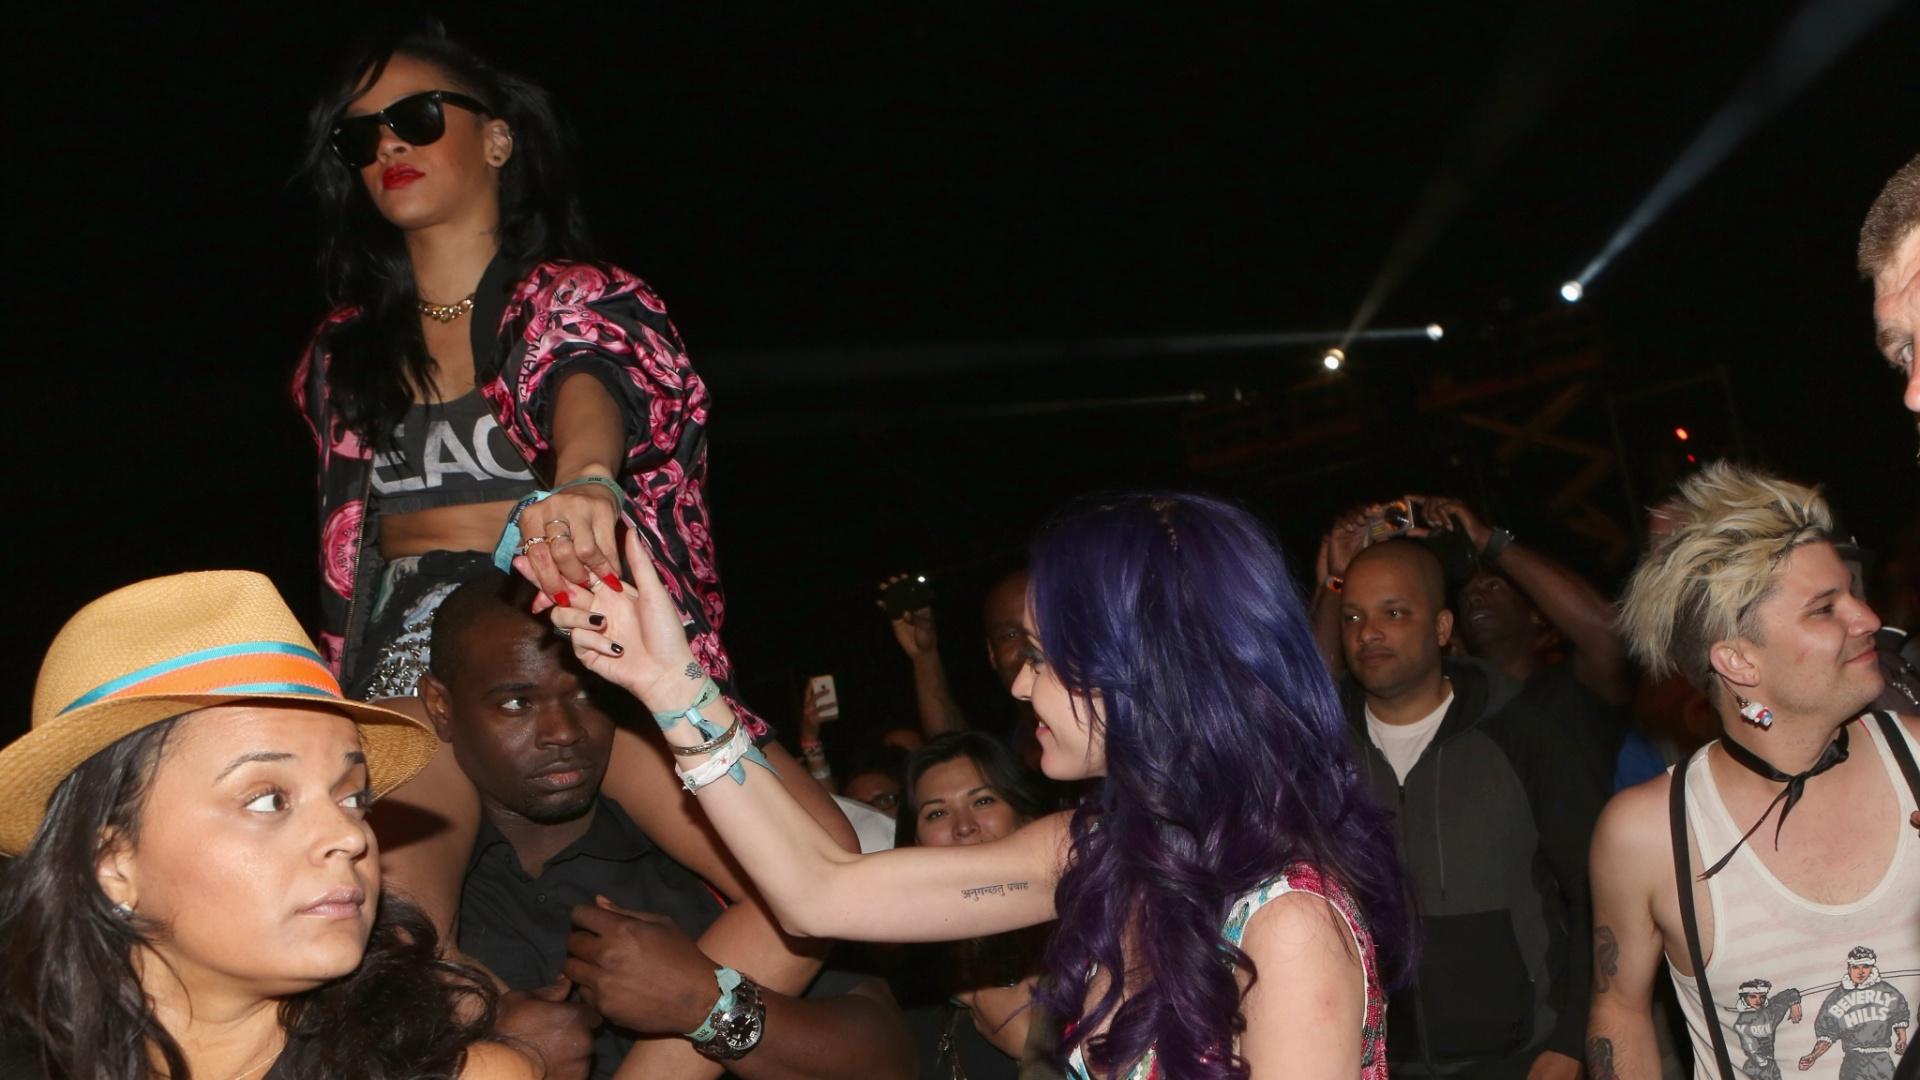 Na plateia, Rihanna e Katy Perry se divertem no festival Coachella (15/4/12)